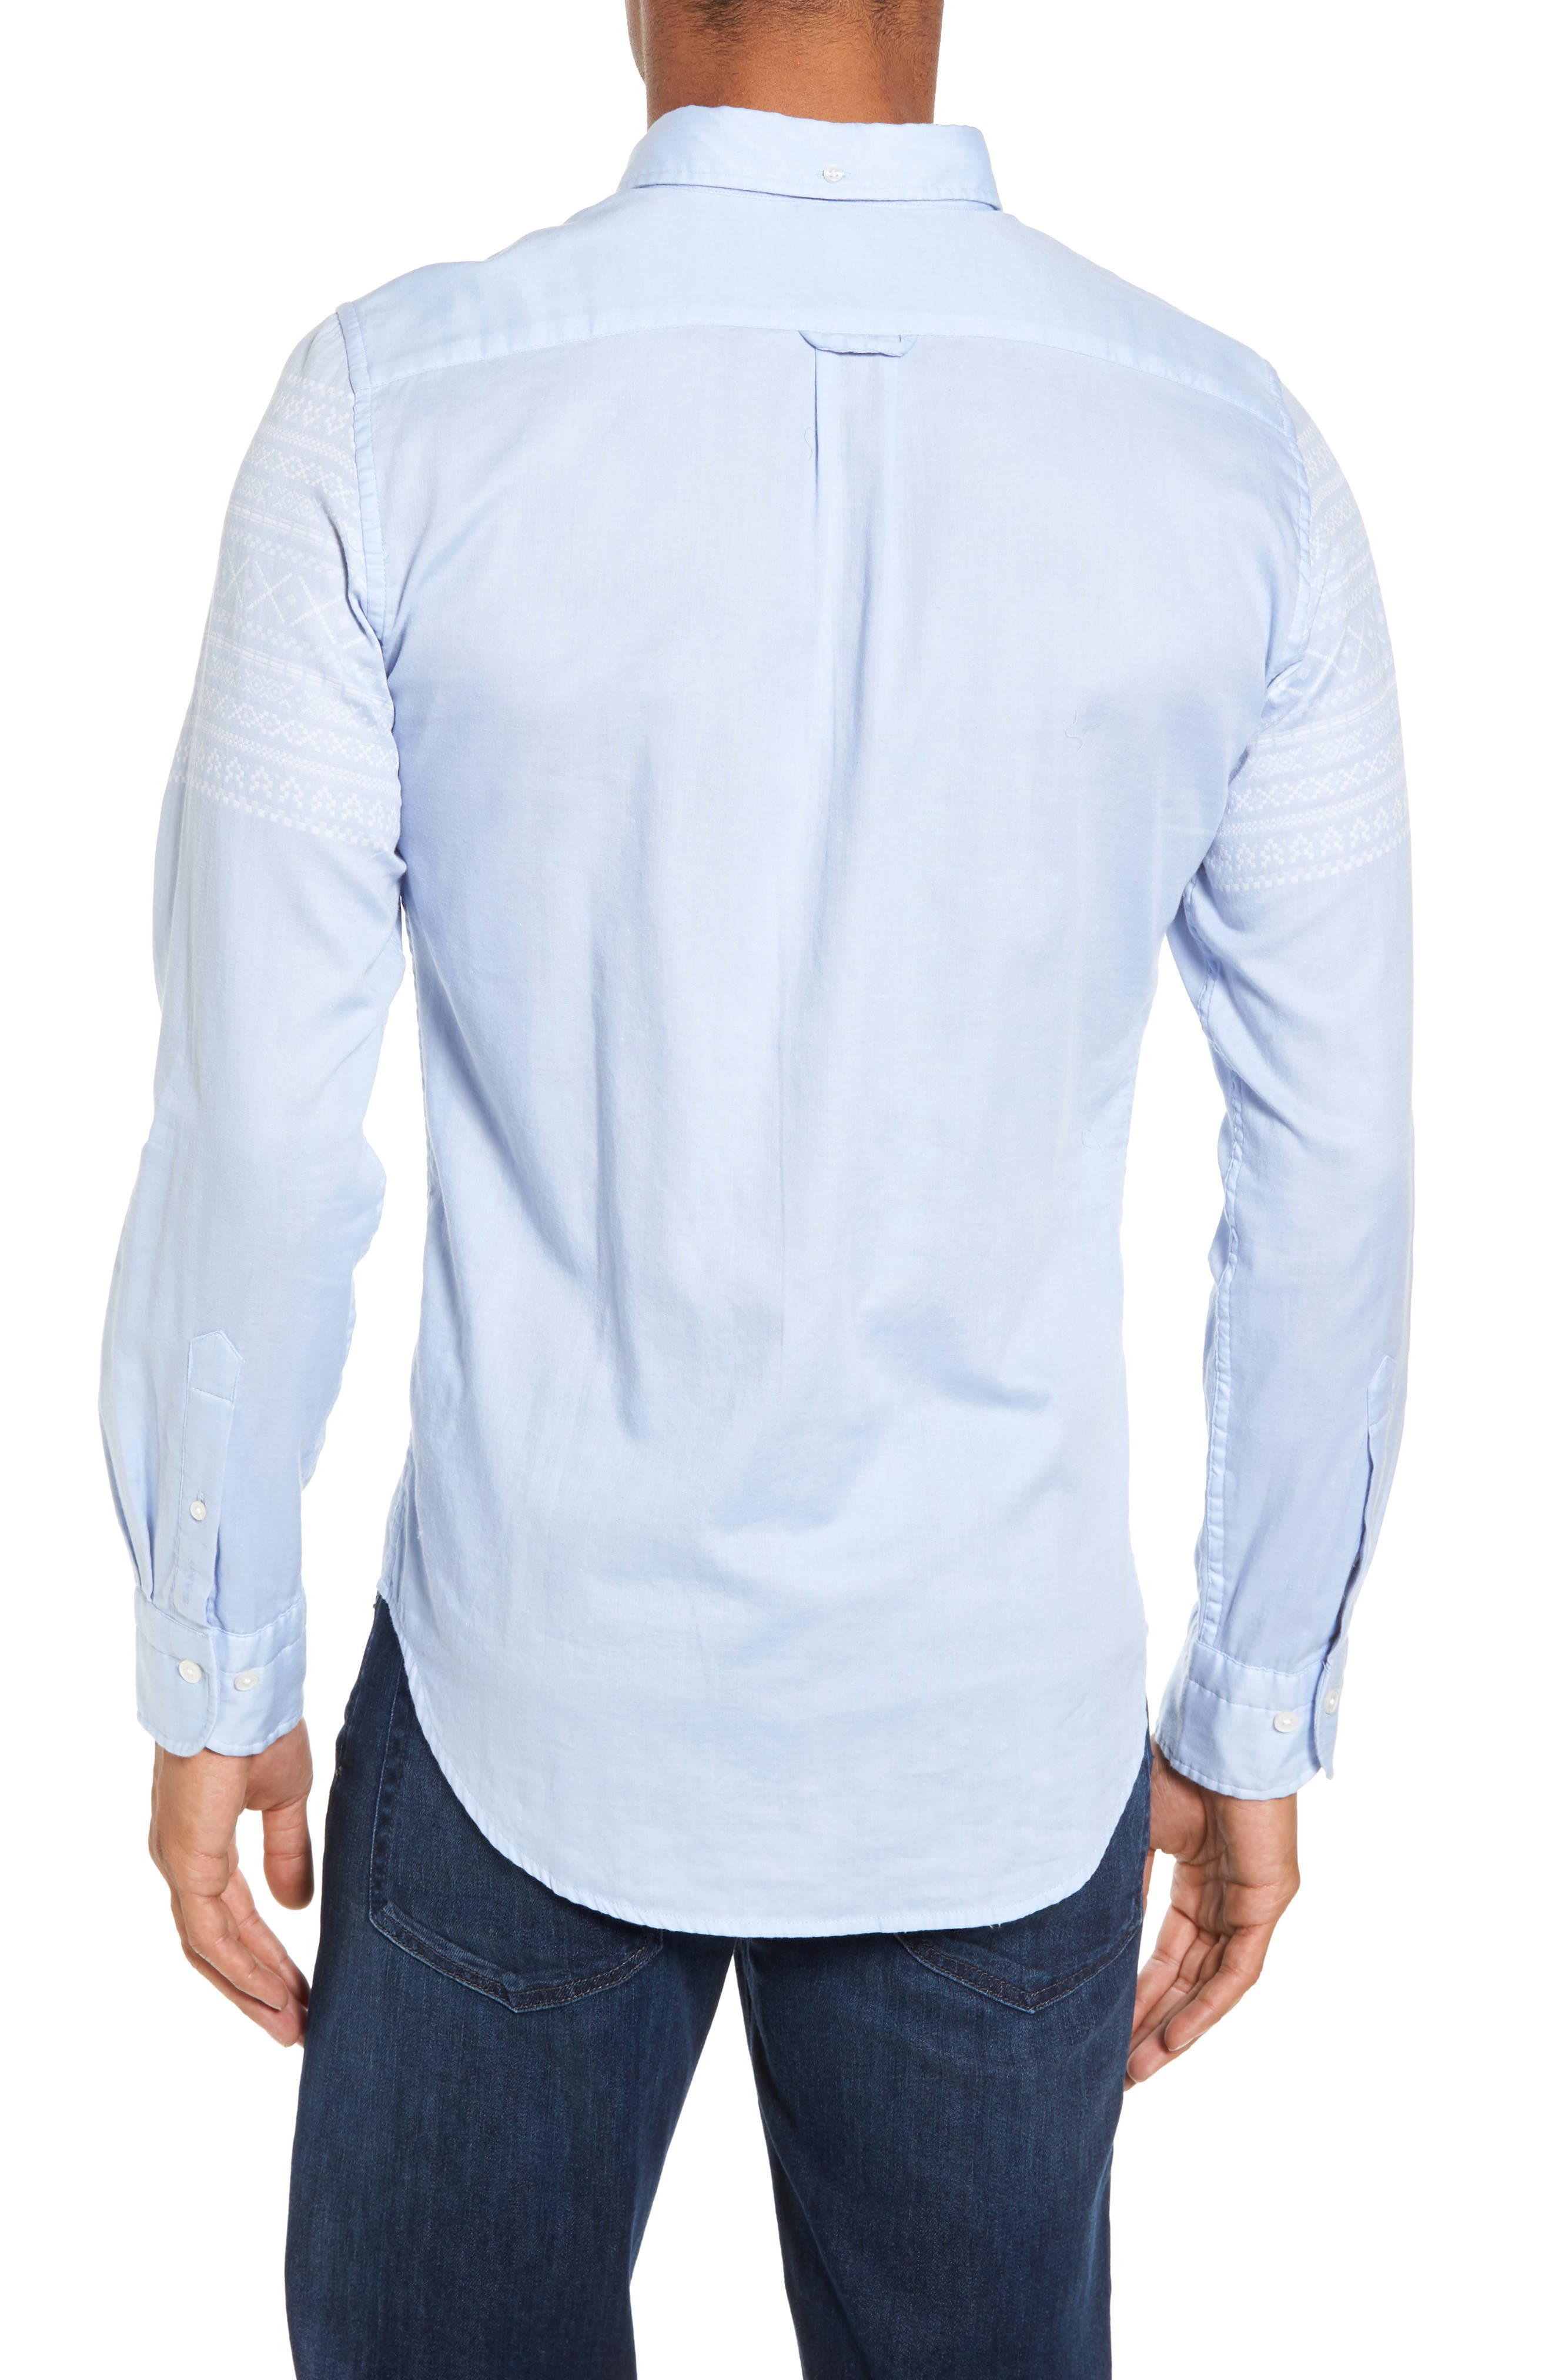 02 Extra Slim Fit Fair Isle Print Sport Shirt,                             Alternate thumbnail 2, color,                             Hamptons Blue